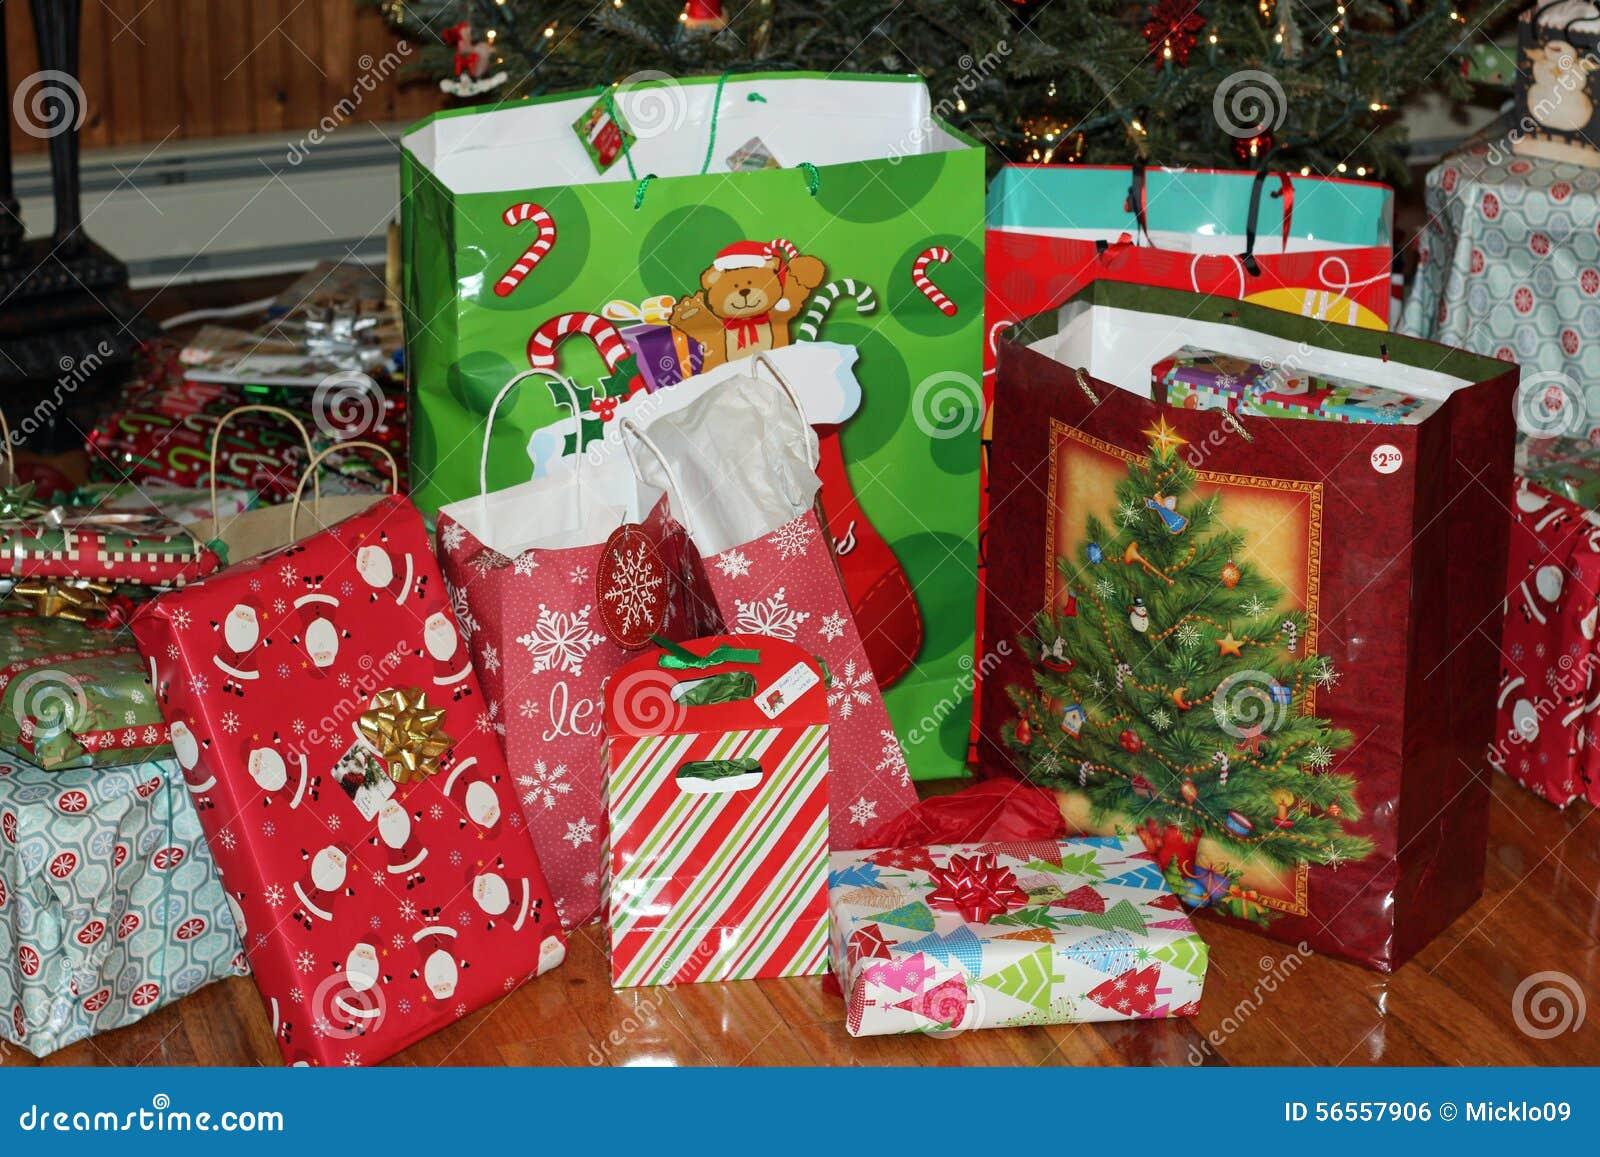 Download χριστουγεννιάτικο δώρο Weihnachtspakete Στοκ Εικόνες - εικόνα από ανοιγμένος, bowwow: 56557906